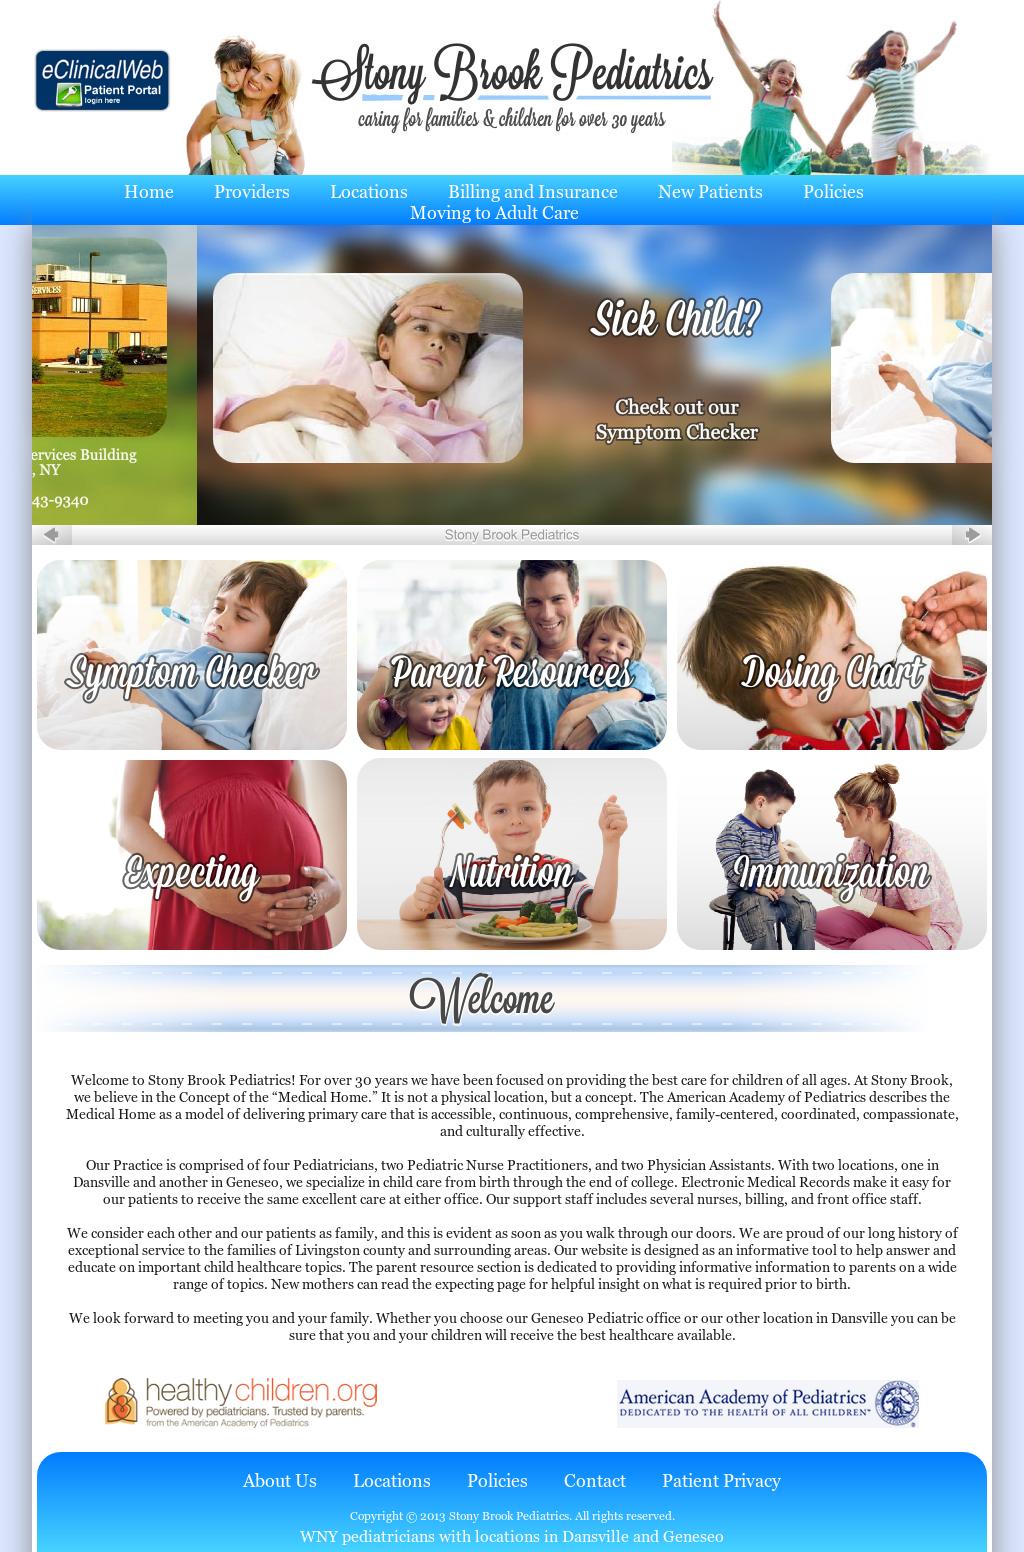 Stony Brook Pediatrics Competitors, Revenue and Employees - Owler